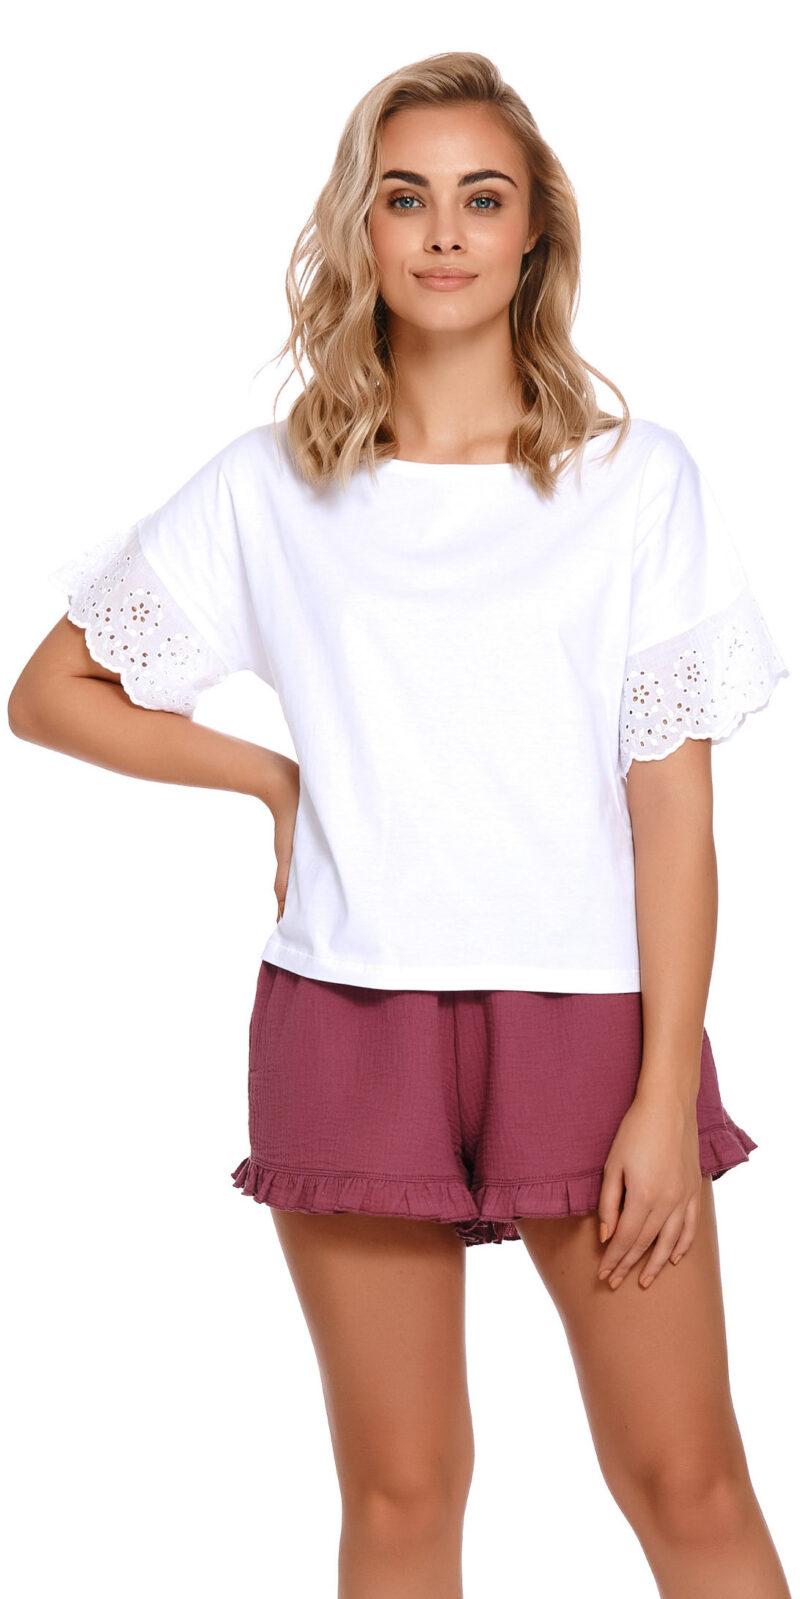 9905 BLUEBERRY 9906 WHITE (K) (2)